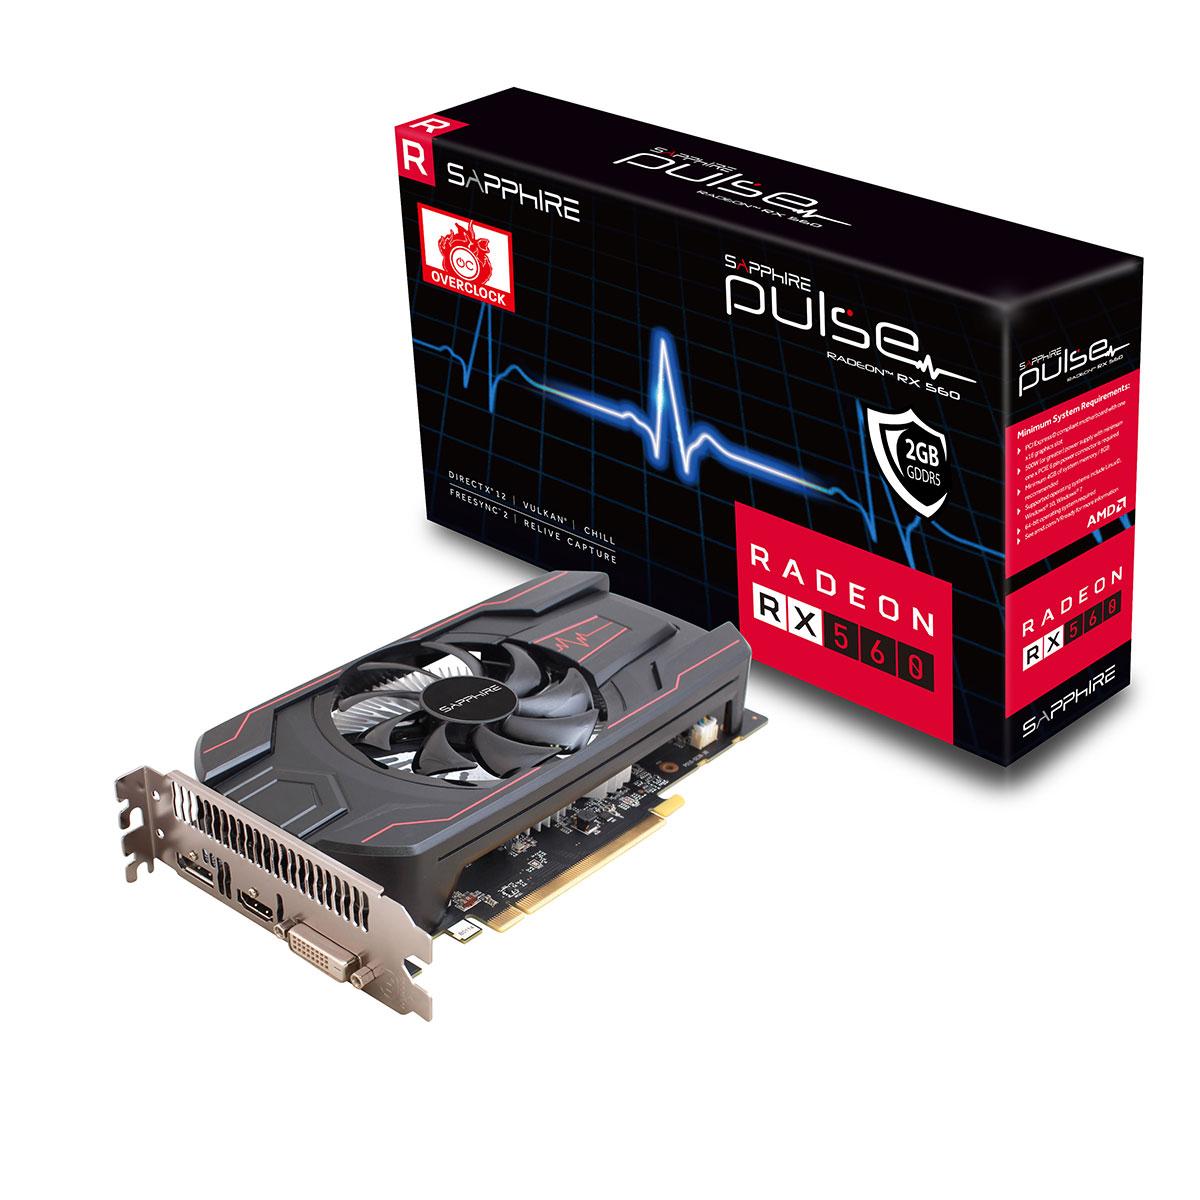 Carte graphique Sapphire PULSE Radeon RX 560 2GD5 OC 2 Go DVI/HDMI/DisplayPort - PCI Express (AMD Radeon RX 560)